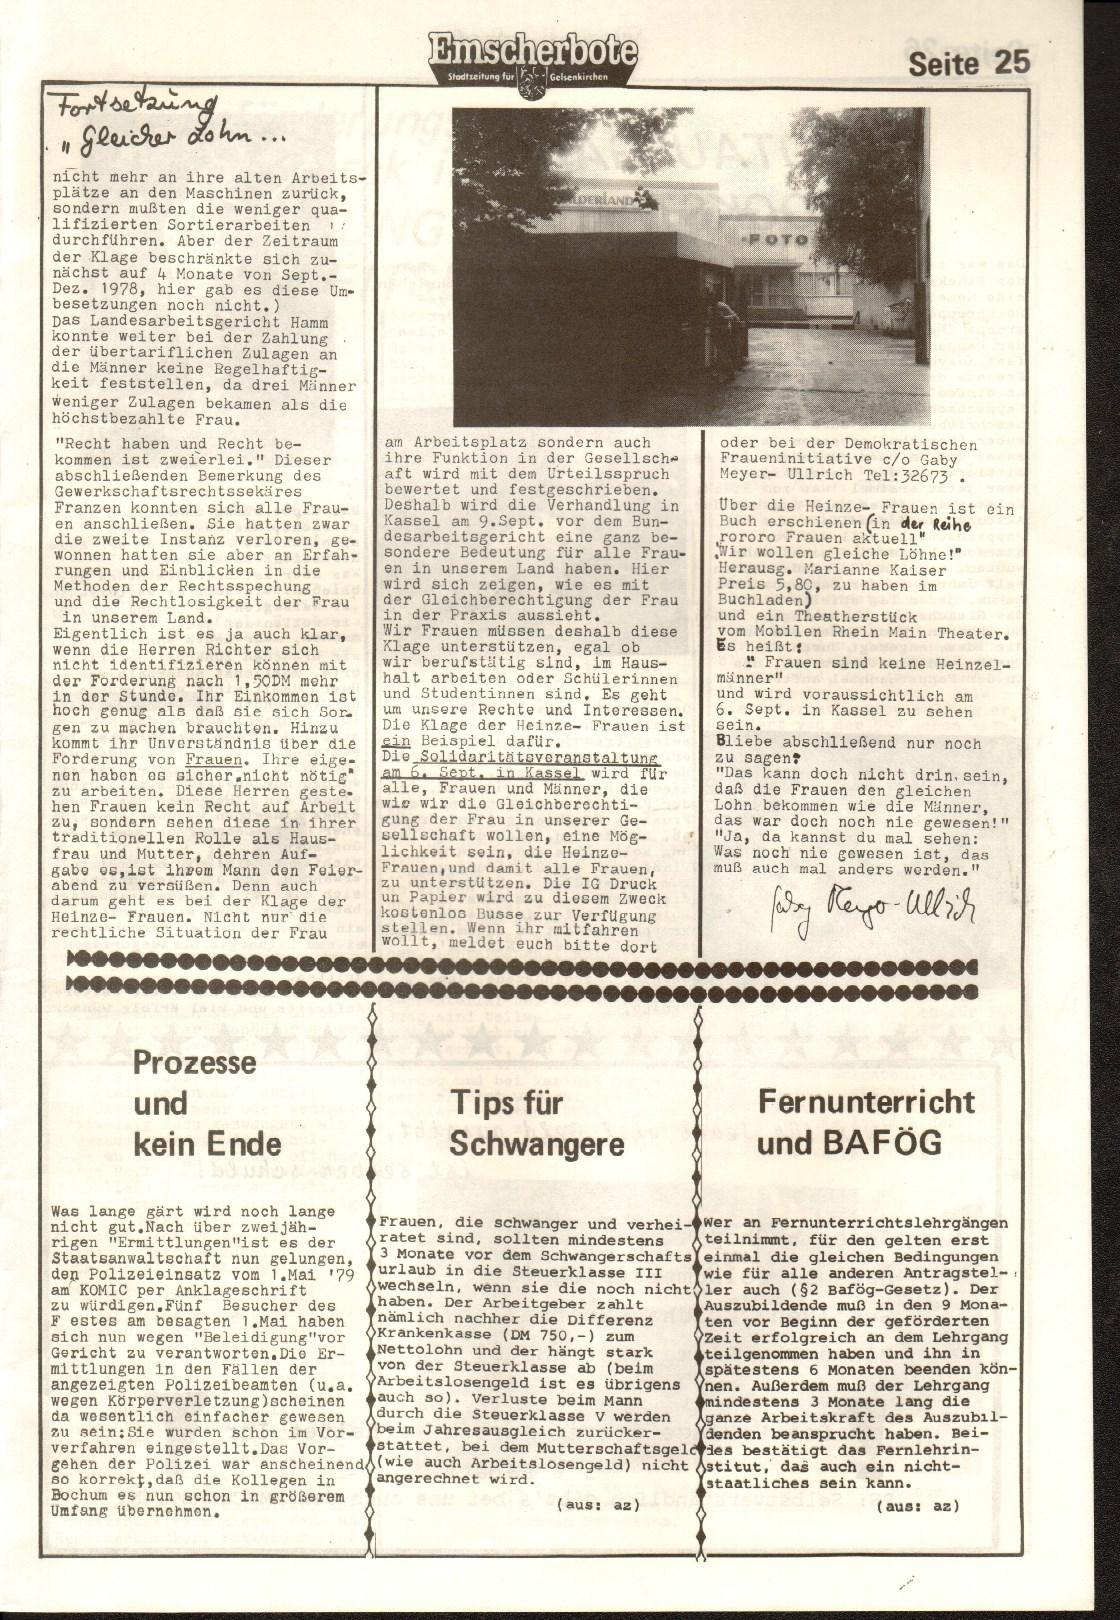 Gelsenkirchen_Emscherbote_1981_09_25